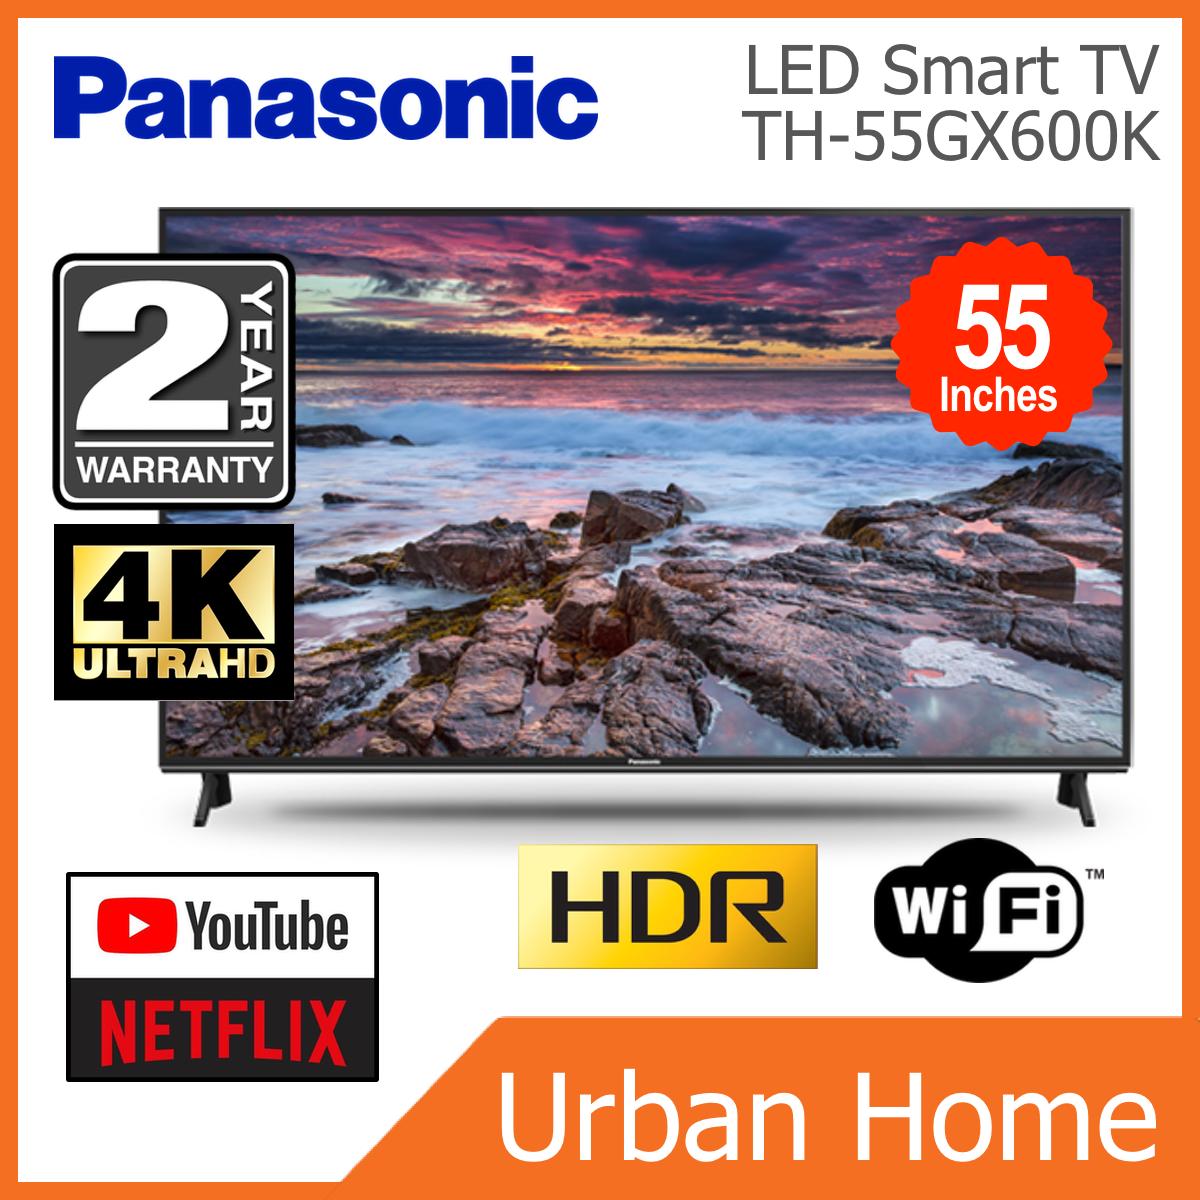 "PANASONIC 55"" 4K UHD HDR LED Smart TV (TH-55GX600K/TH55GX600K/TH-55GX600/TH55GX600)"